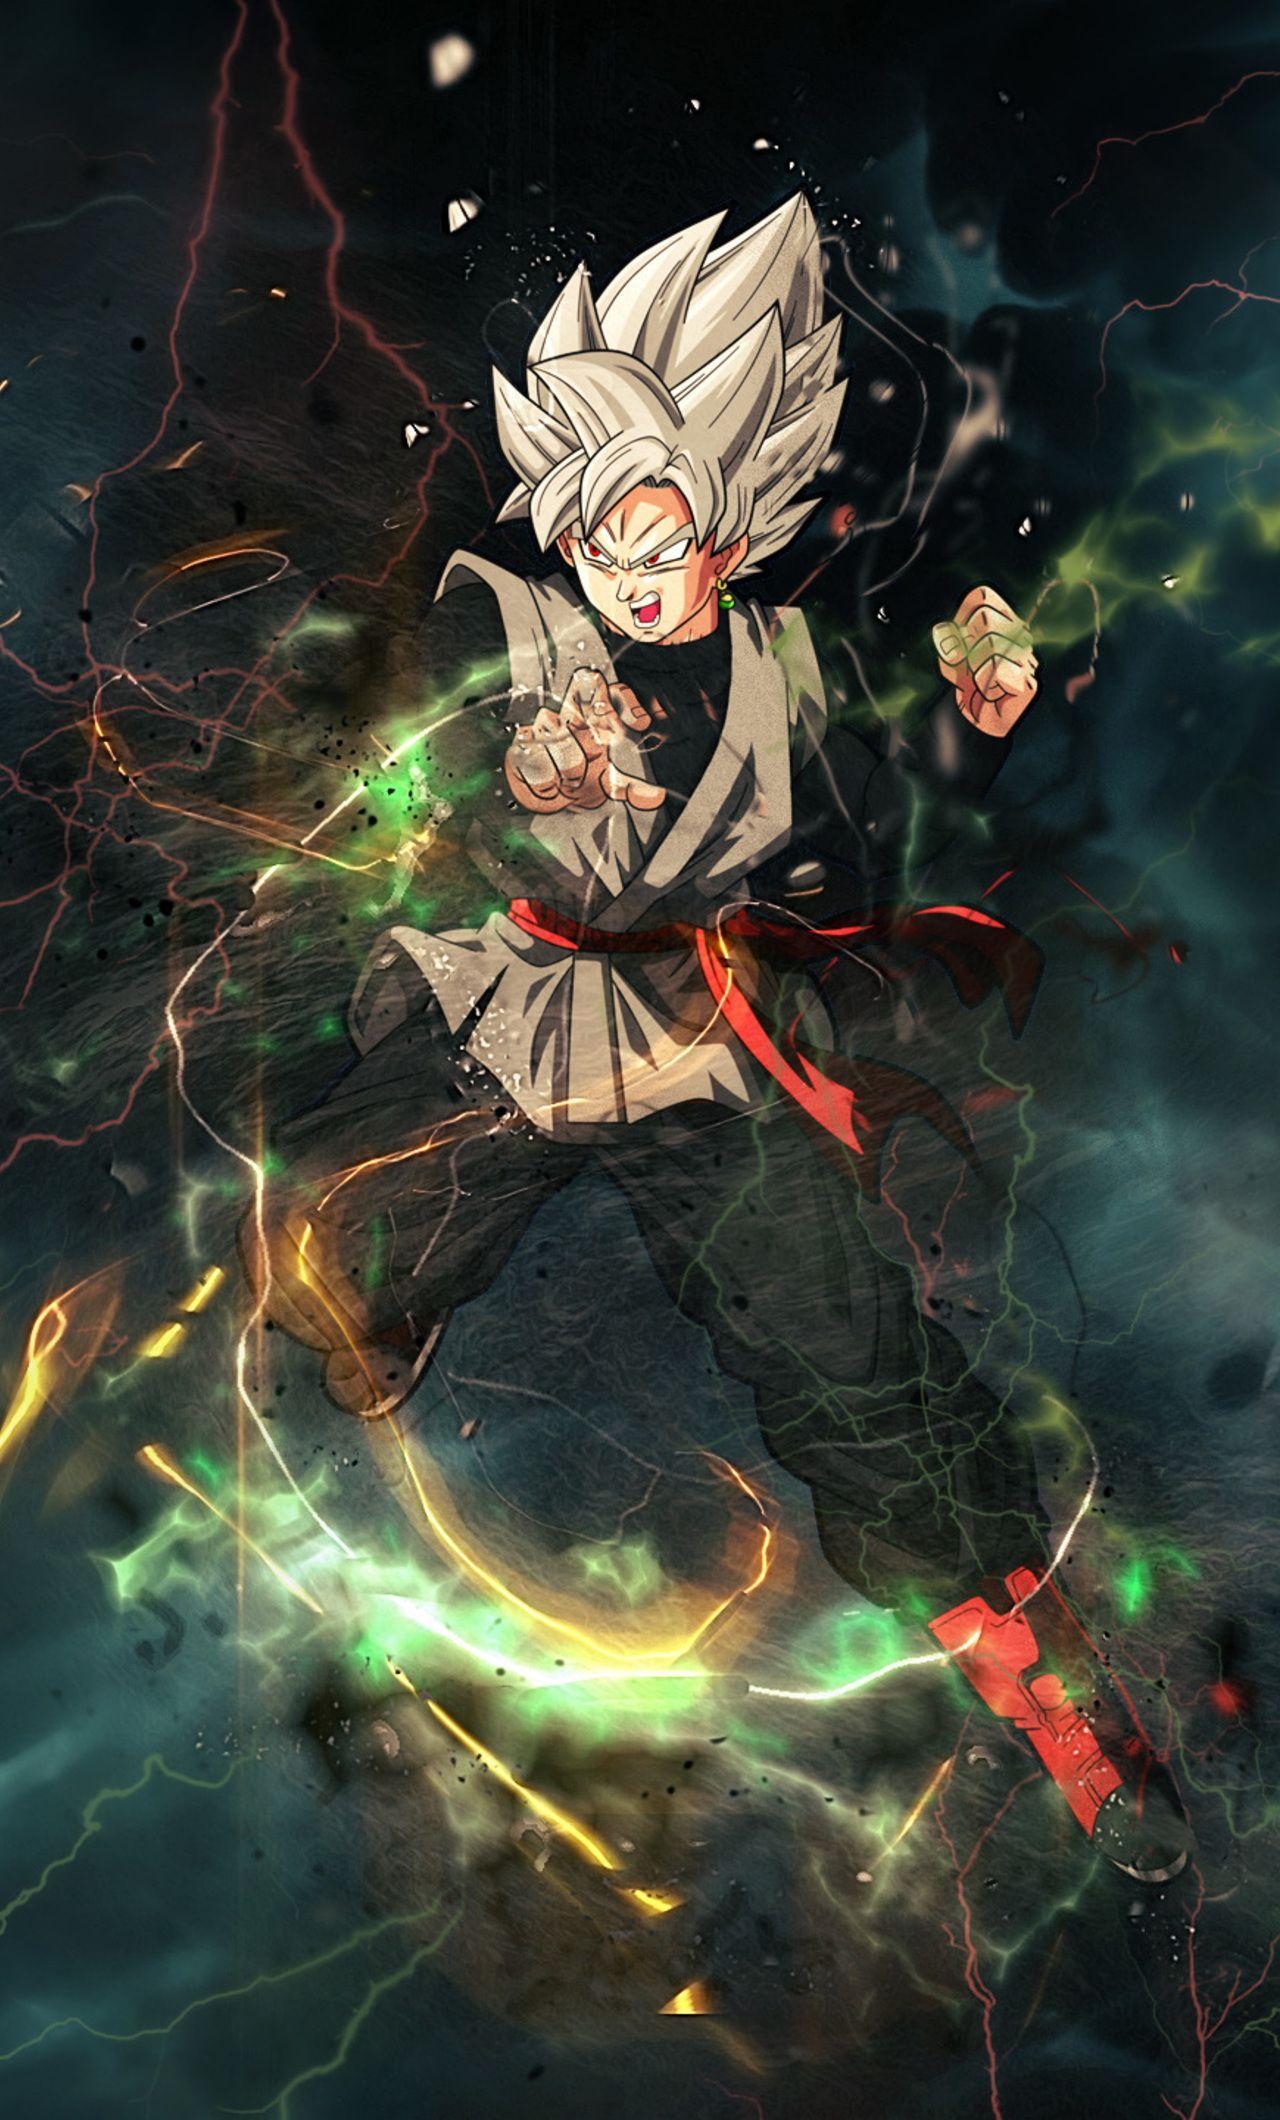 Goku Iphone Wallpapers Wallpaper Cave